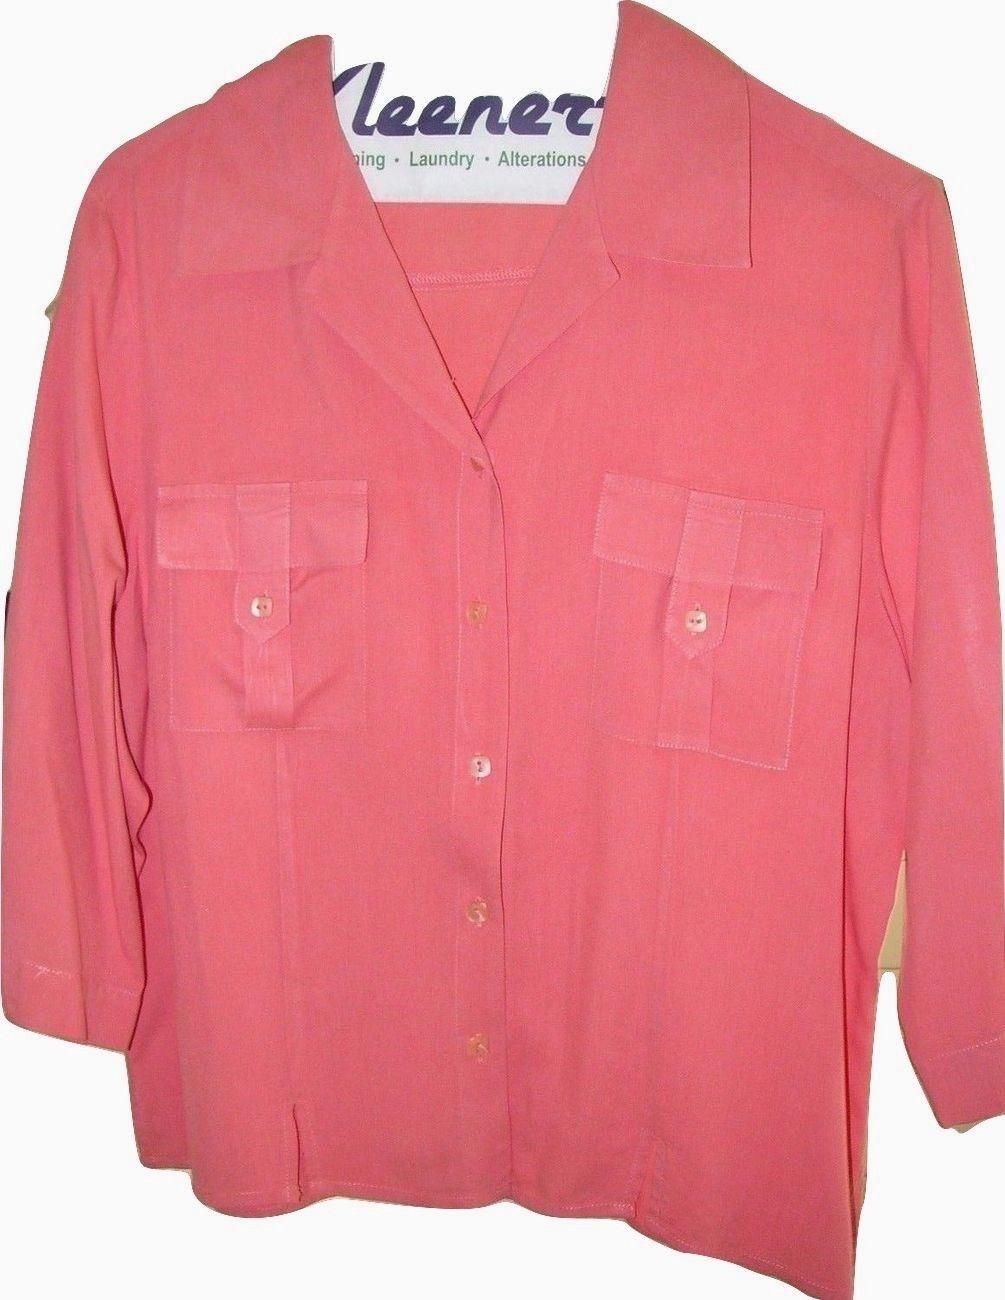 Womens Blouse Shirt Soft Cotton Rayon Coral Pink Medium NICE!